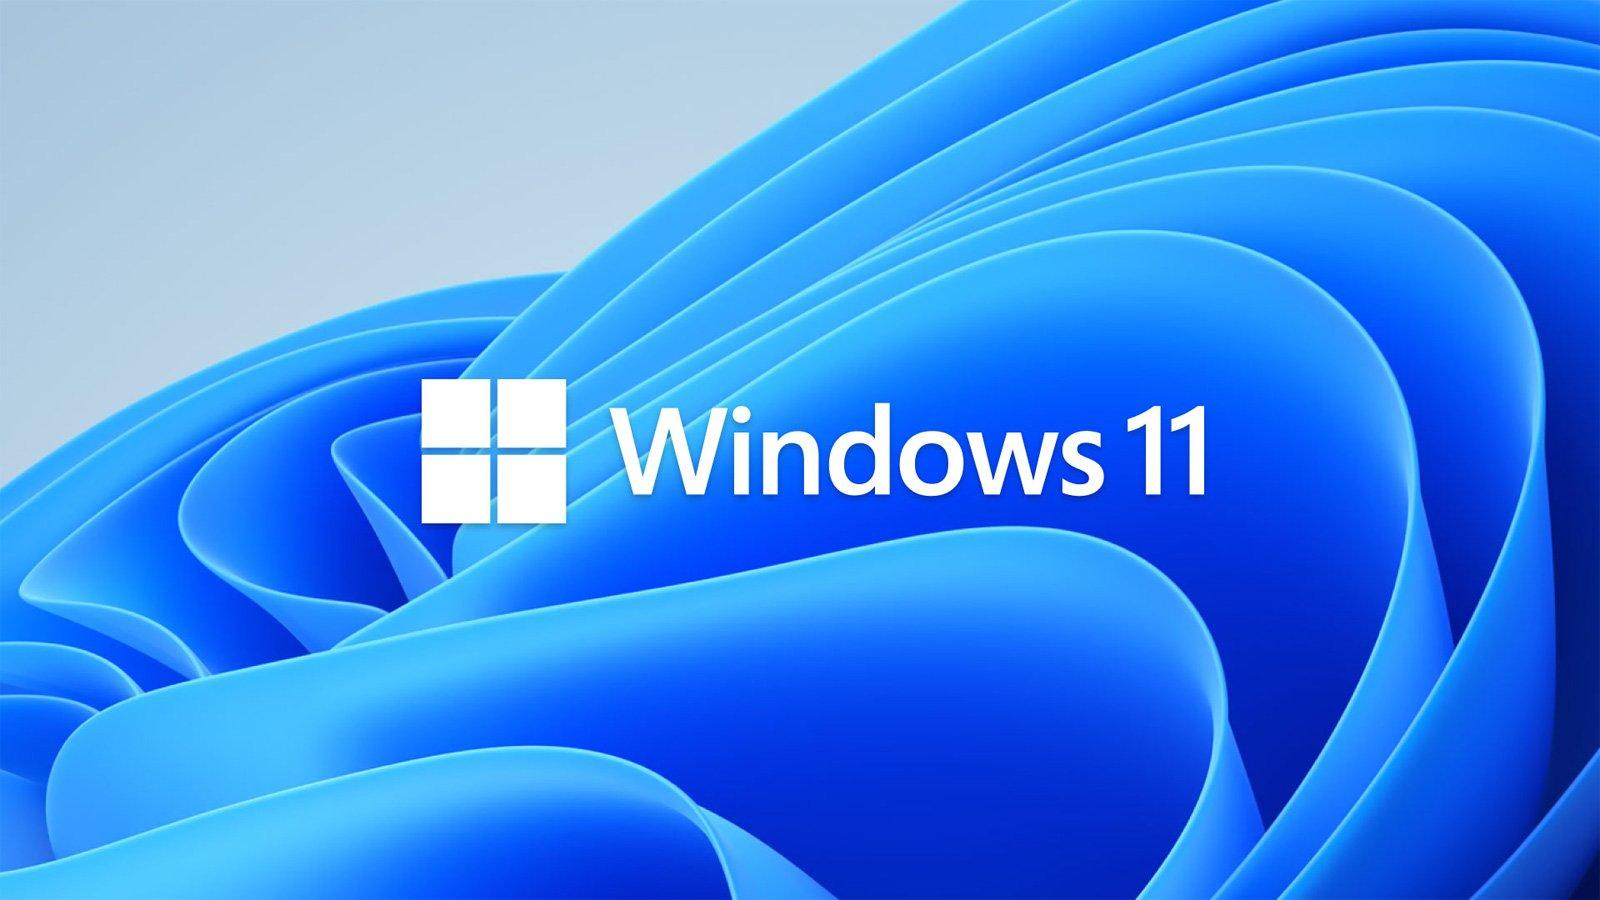 wonderful hd Windows 11 Wallpapers